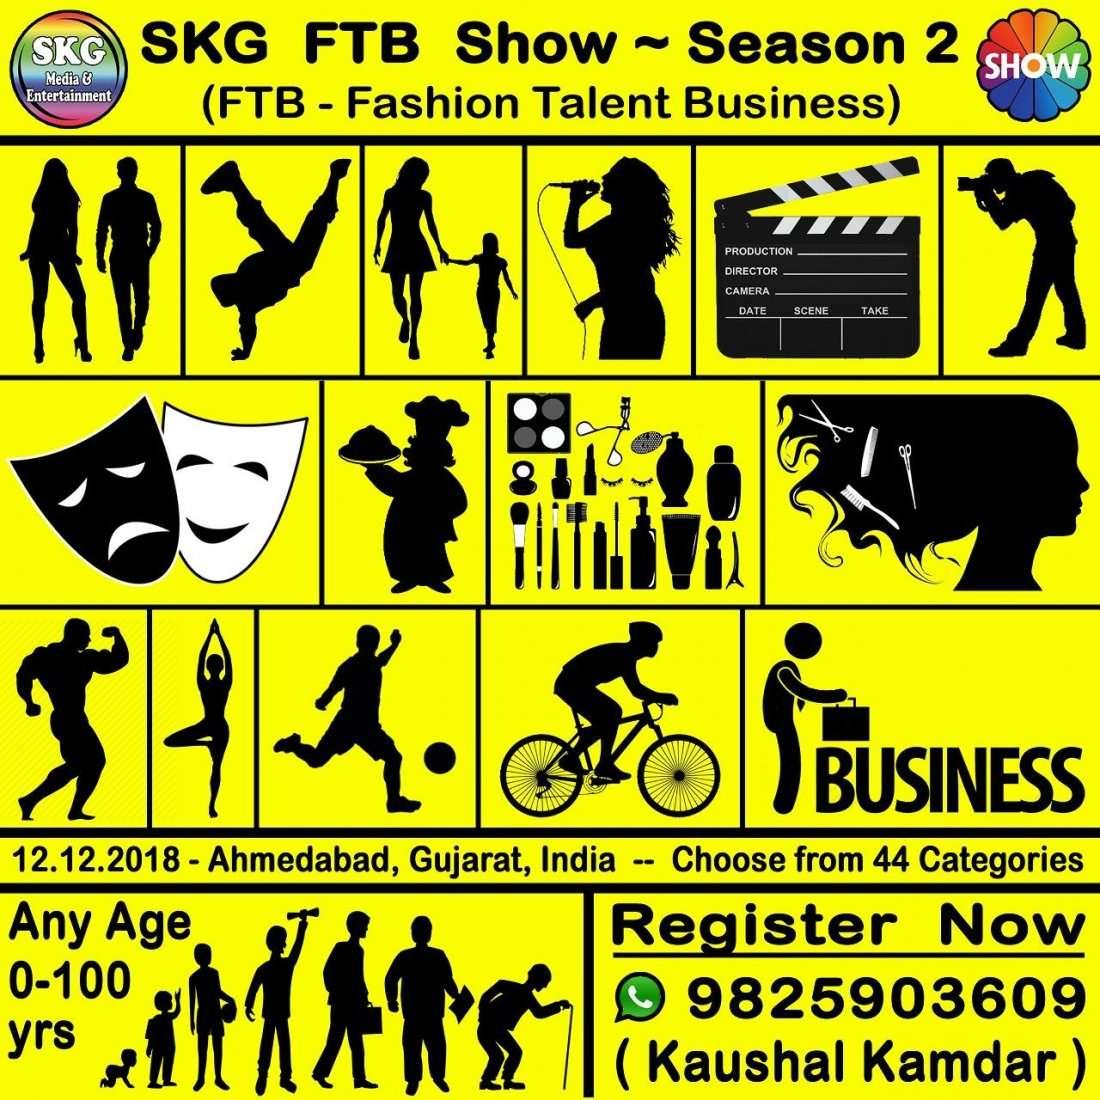 SKG FTB Show - Season 2 - FTB Fashion Talent & Business